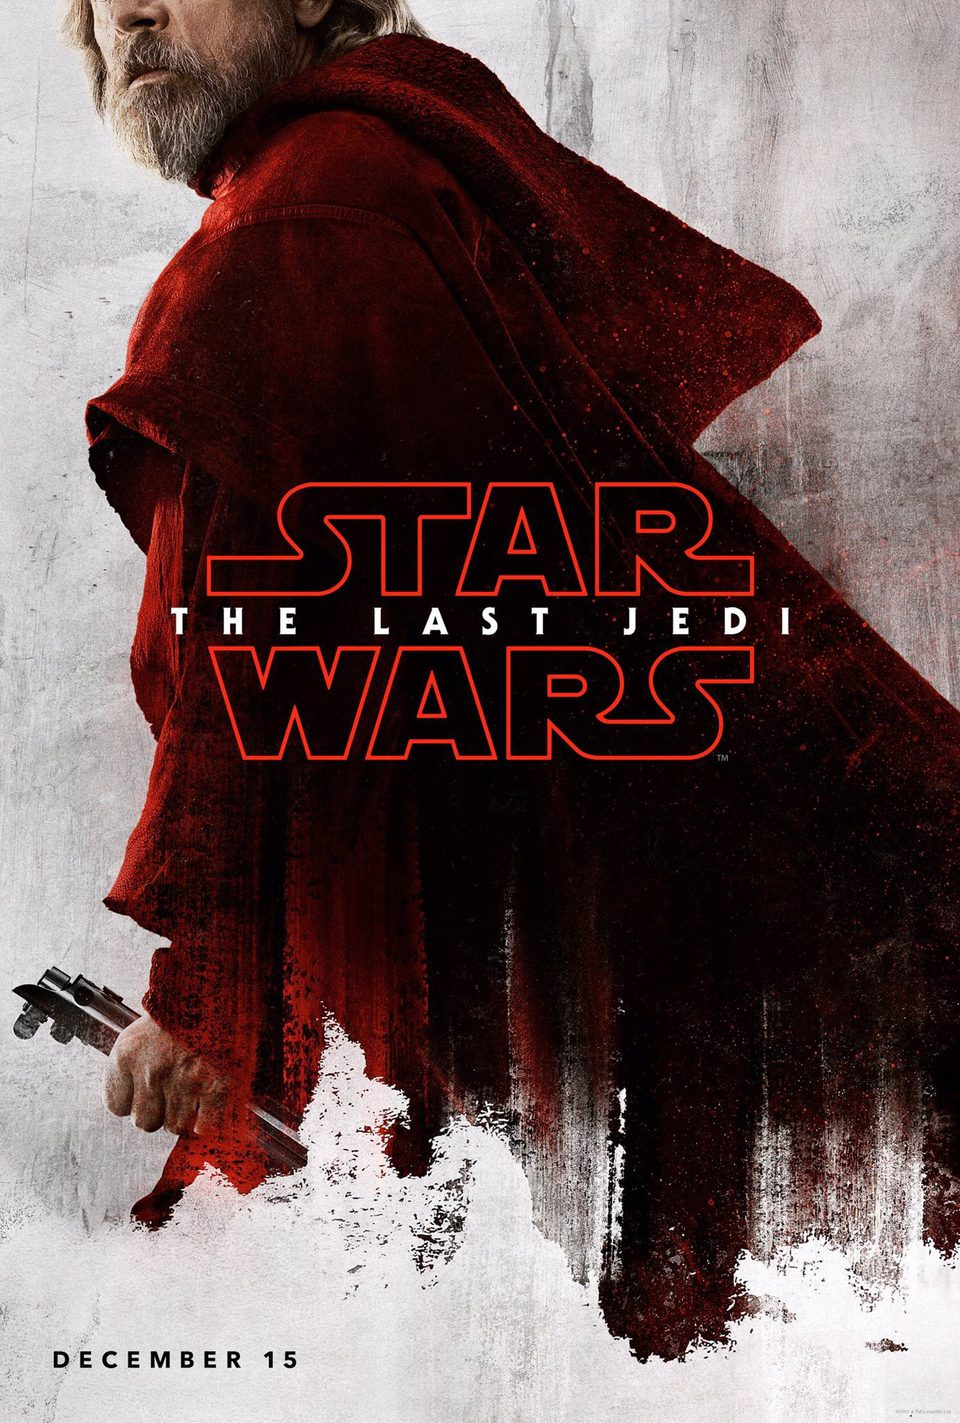 Luke Skywalker poster for Star Wars: The Last Jedi